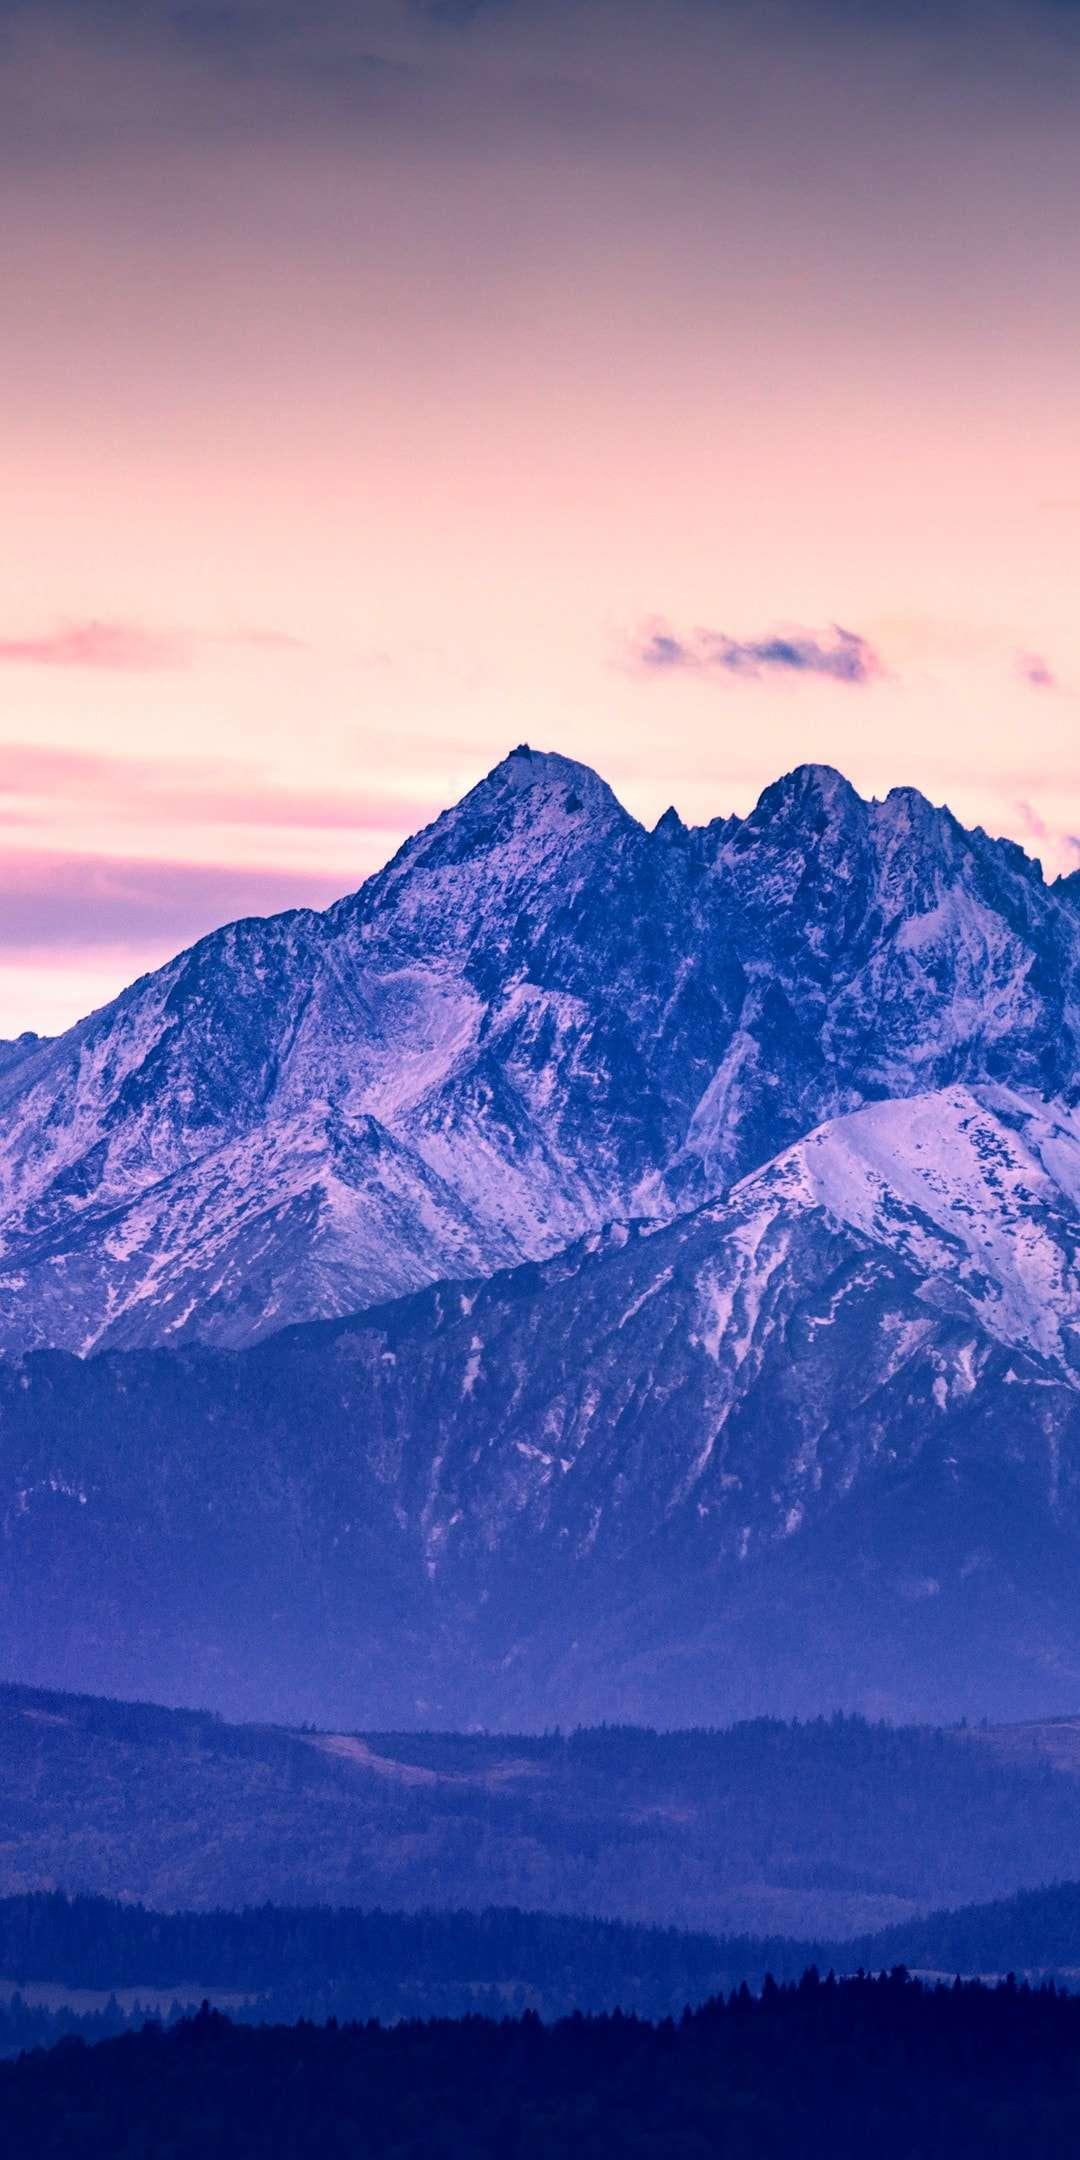 Winter Snow Mountain Nature HD iPhone Wallpaper